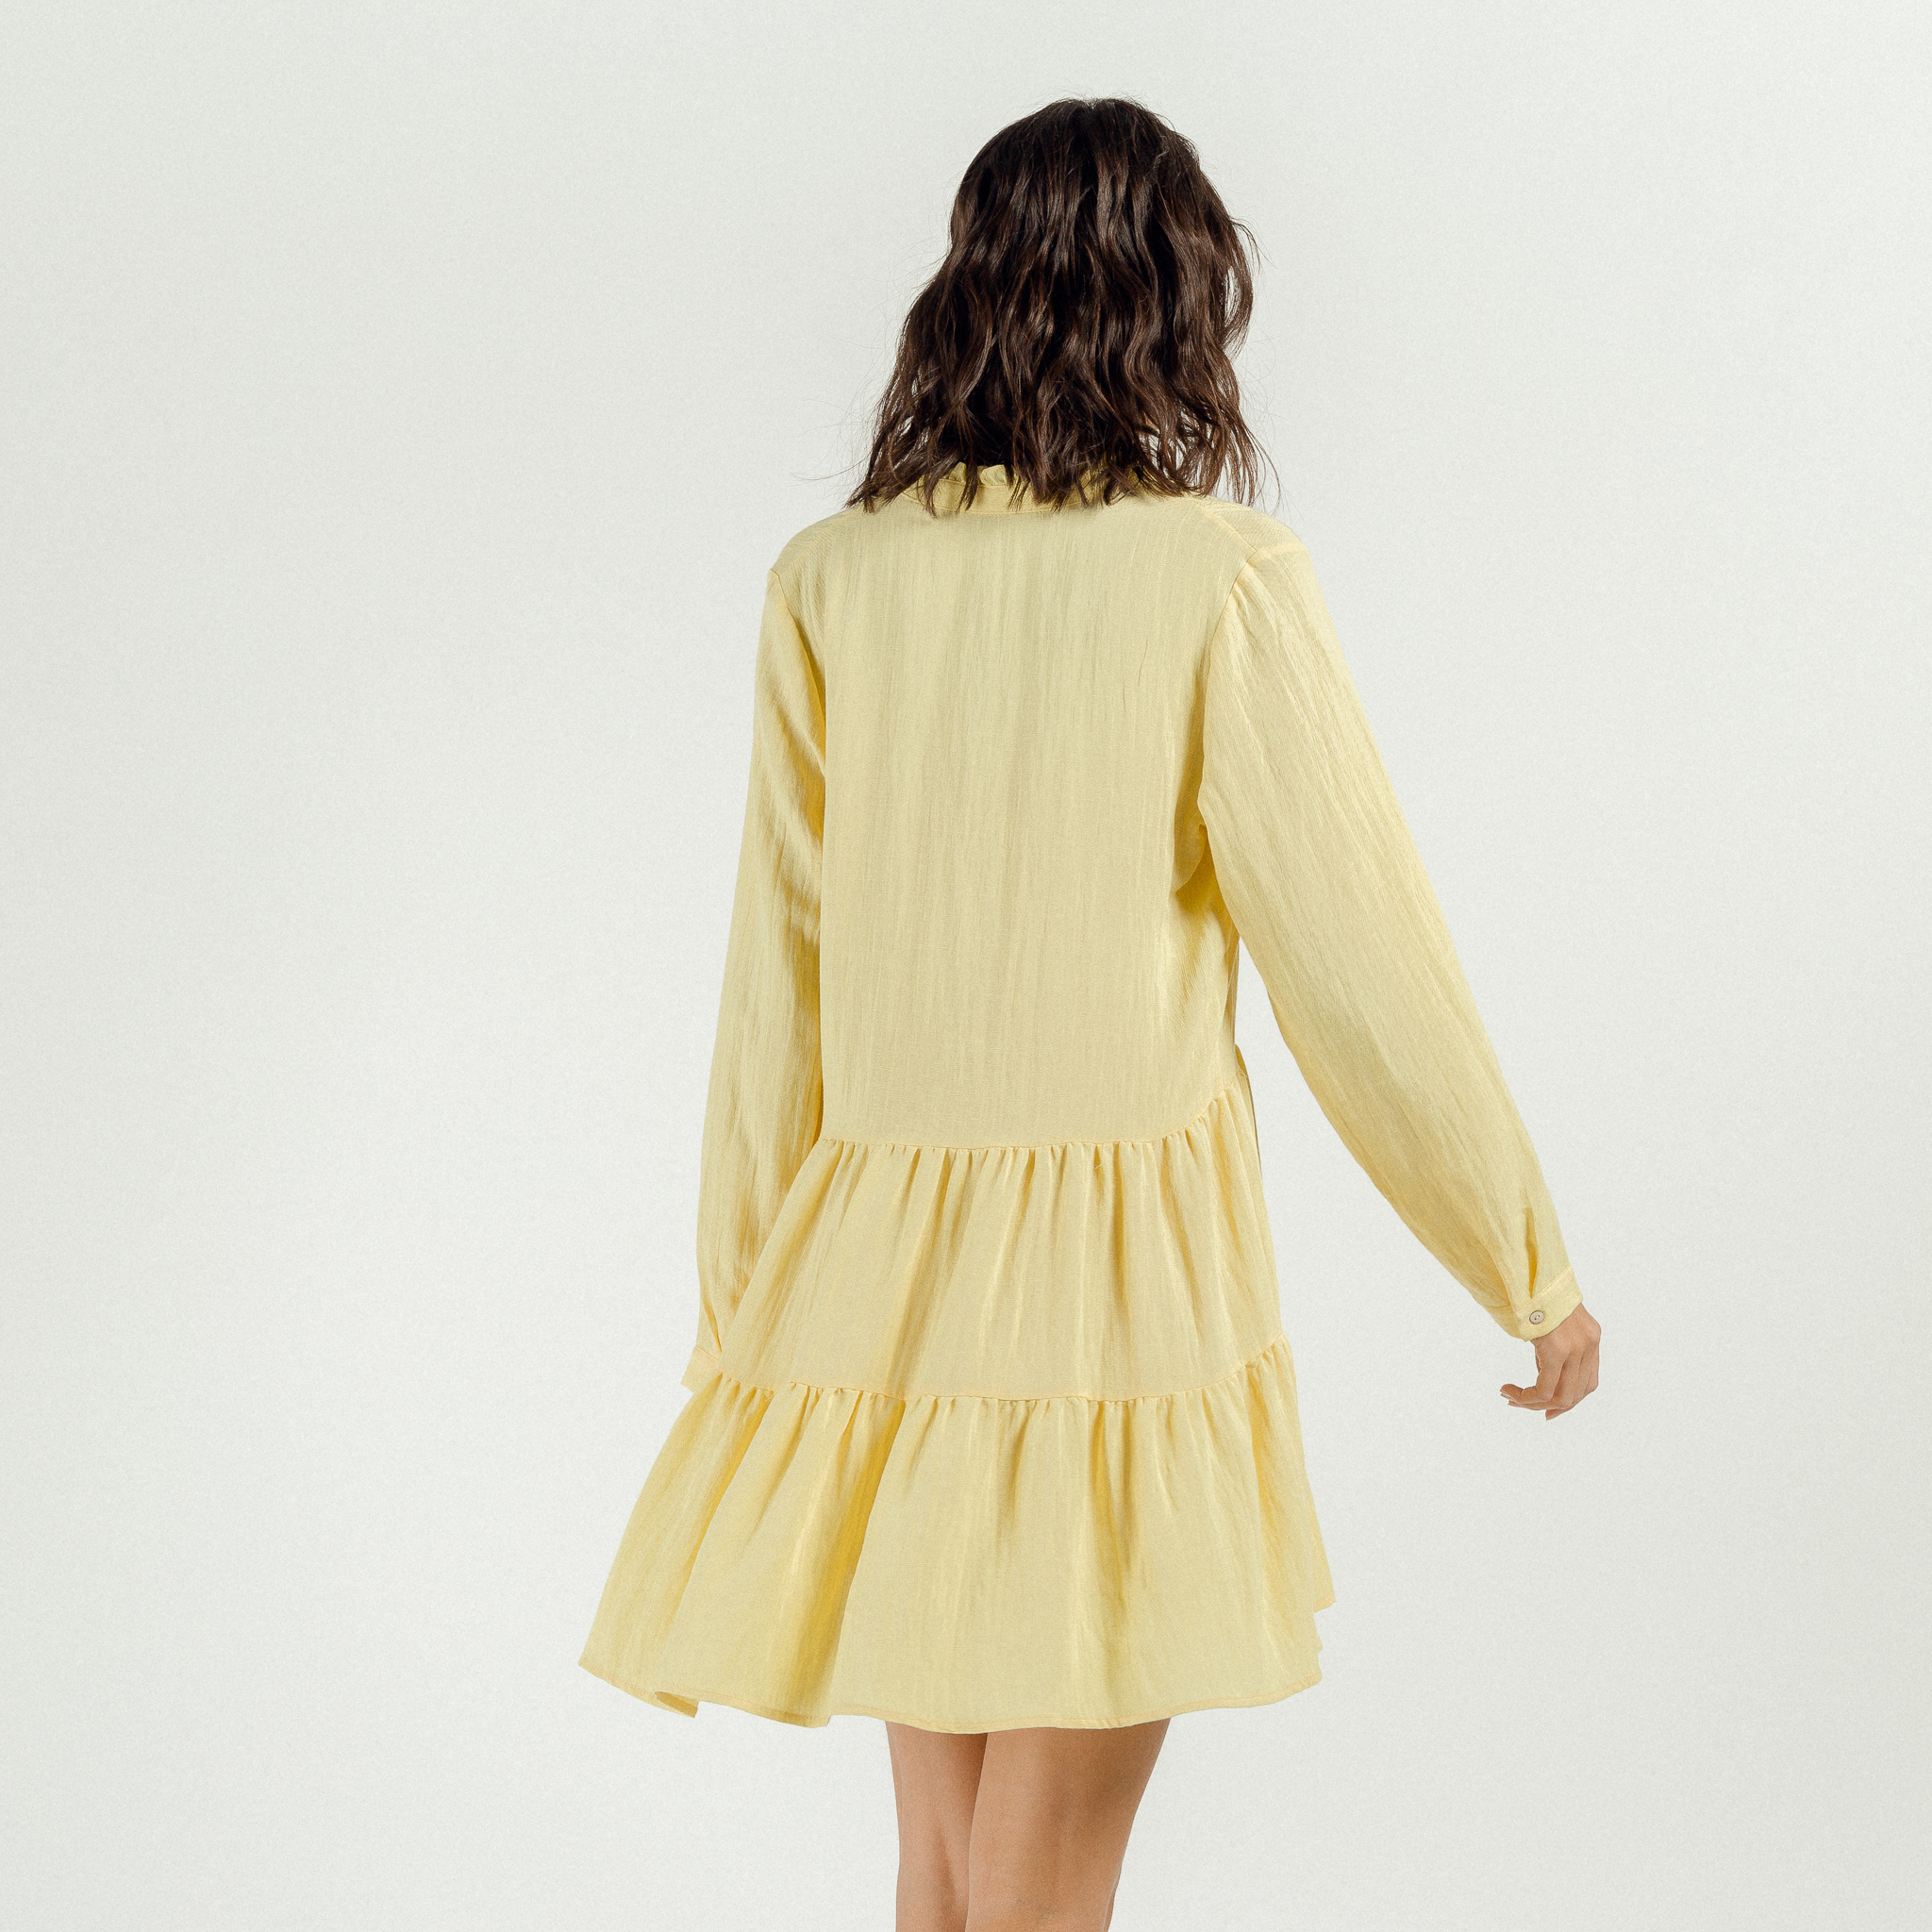 PEPITES robe yellow-4